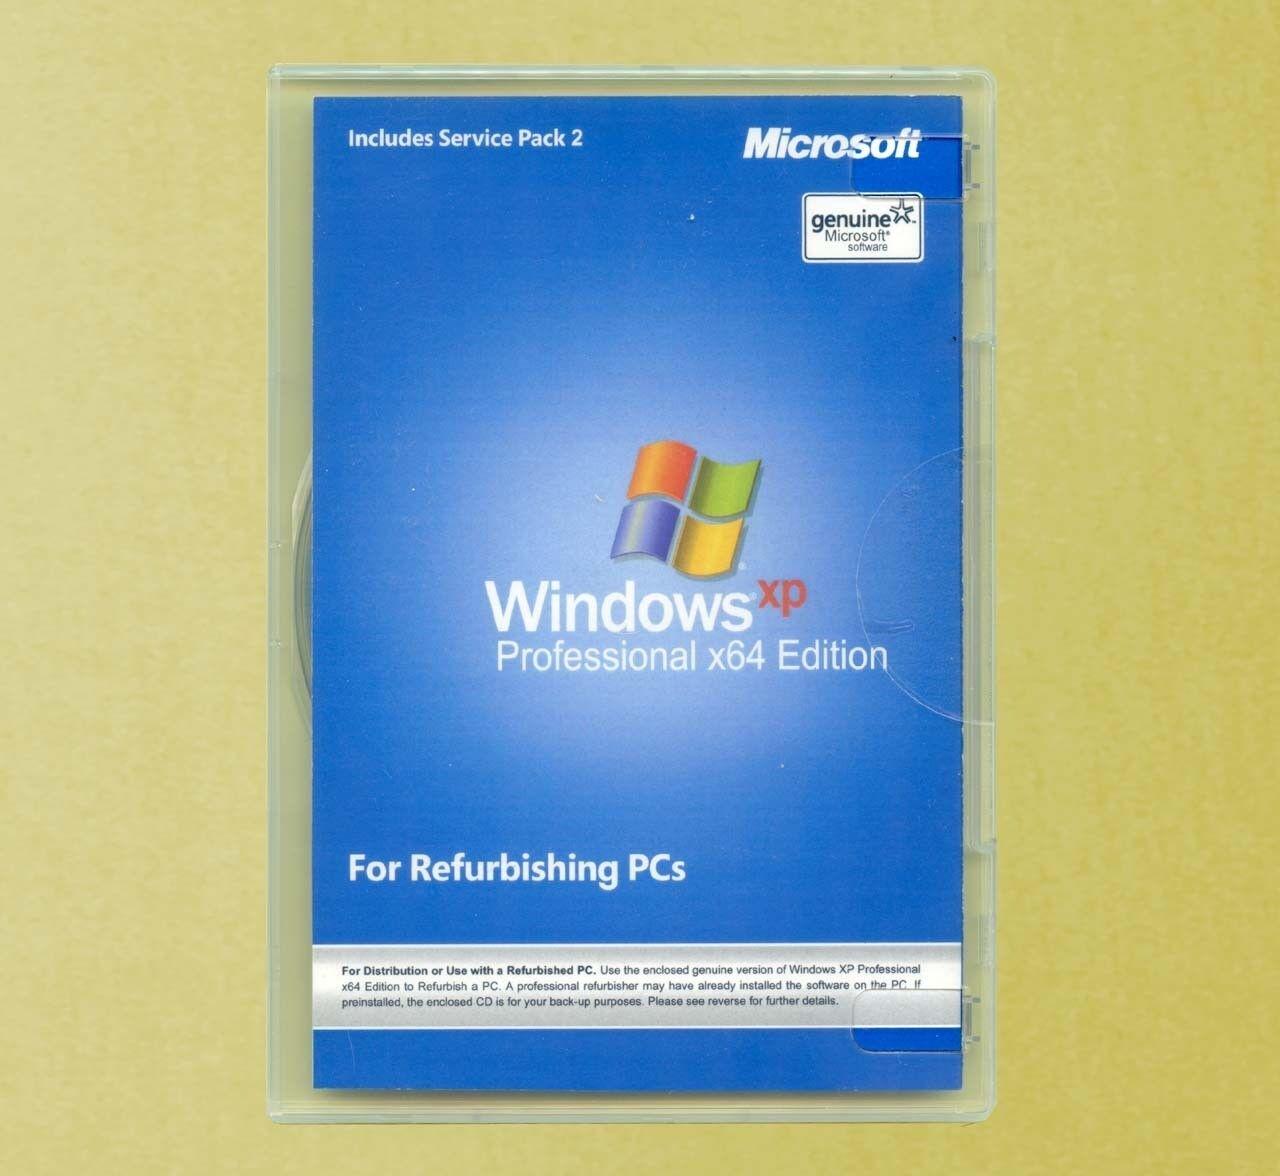 Activewin. Com: microsoft windows xp professional x64 editon.